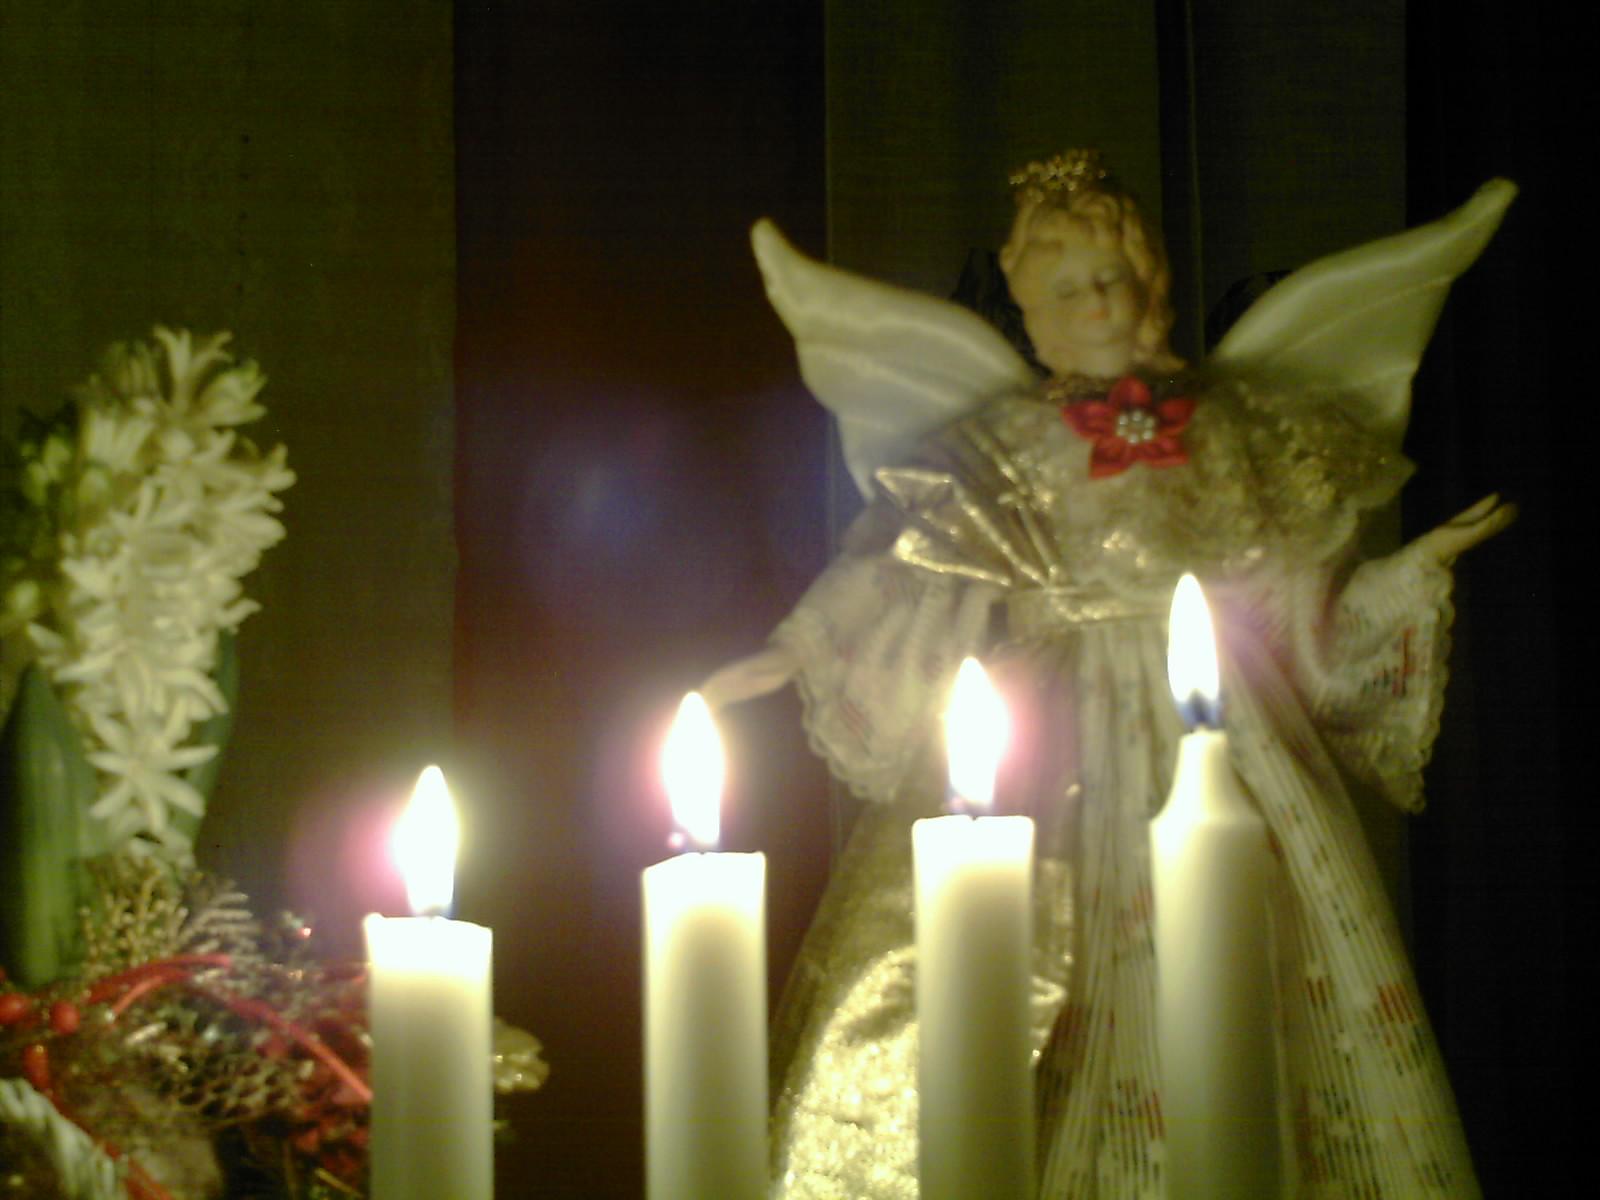 [neljäs+kynttilä+19.12.09]